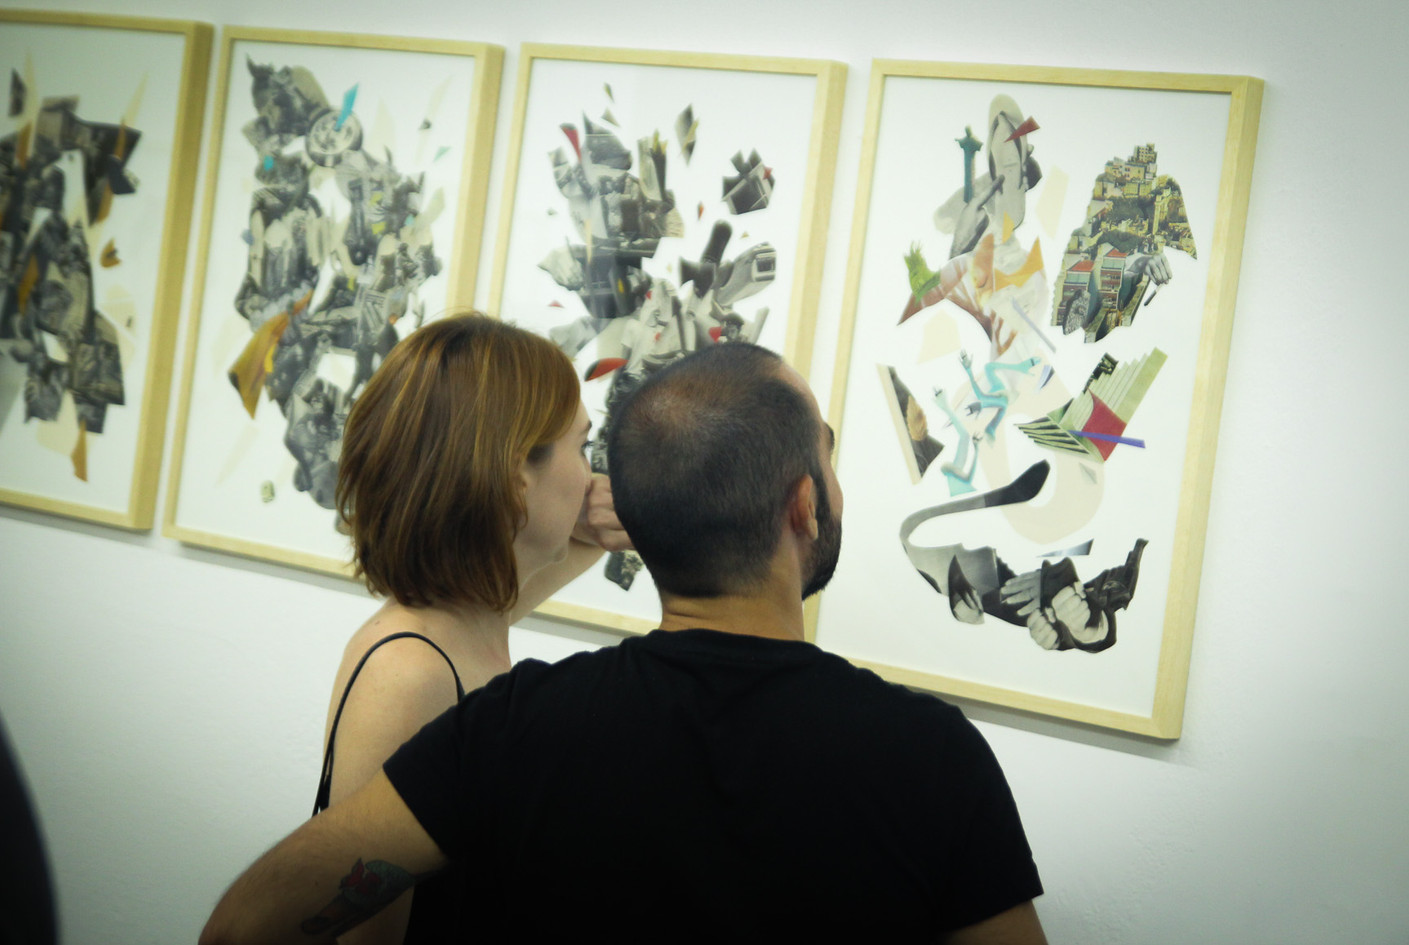 galeria-recorte-by-george-campos-7299.jp